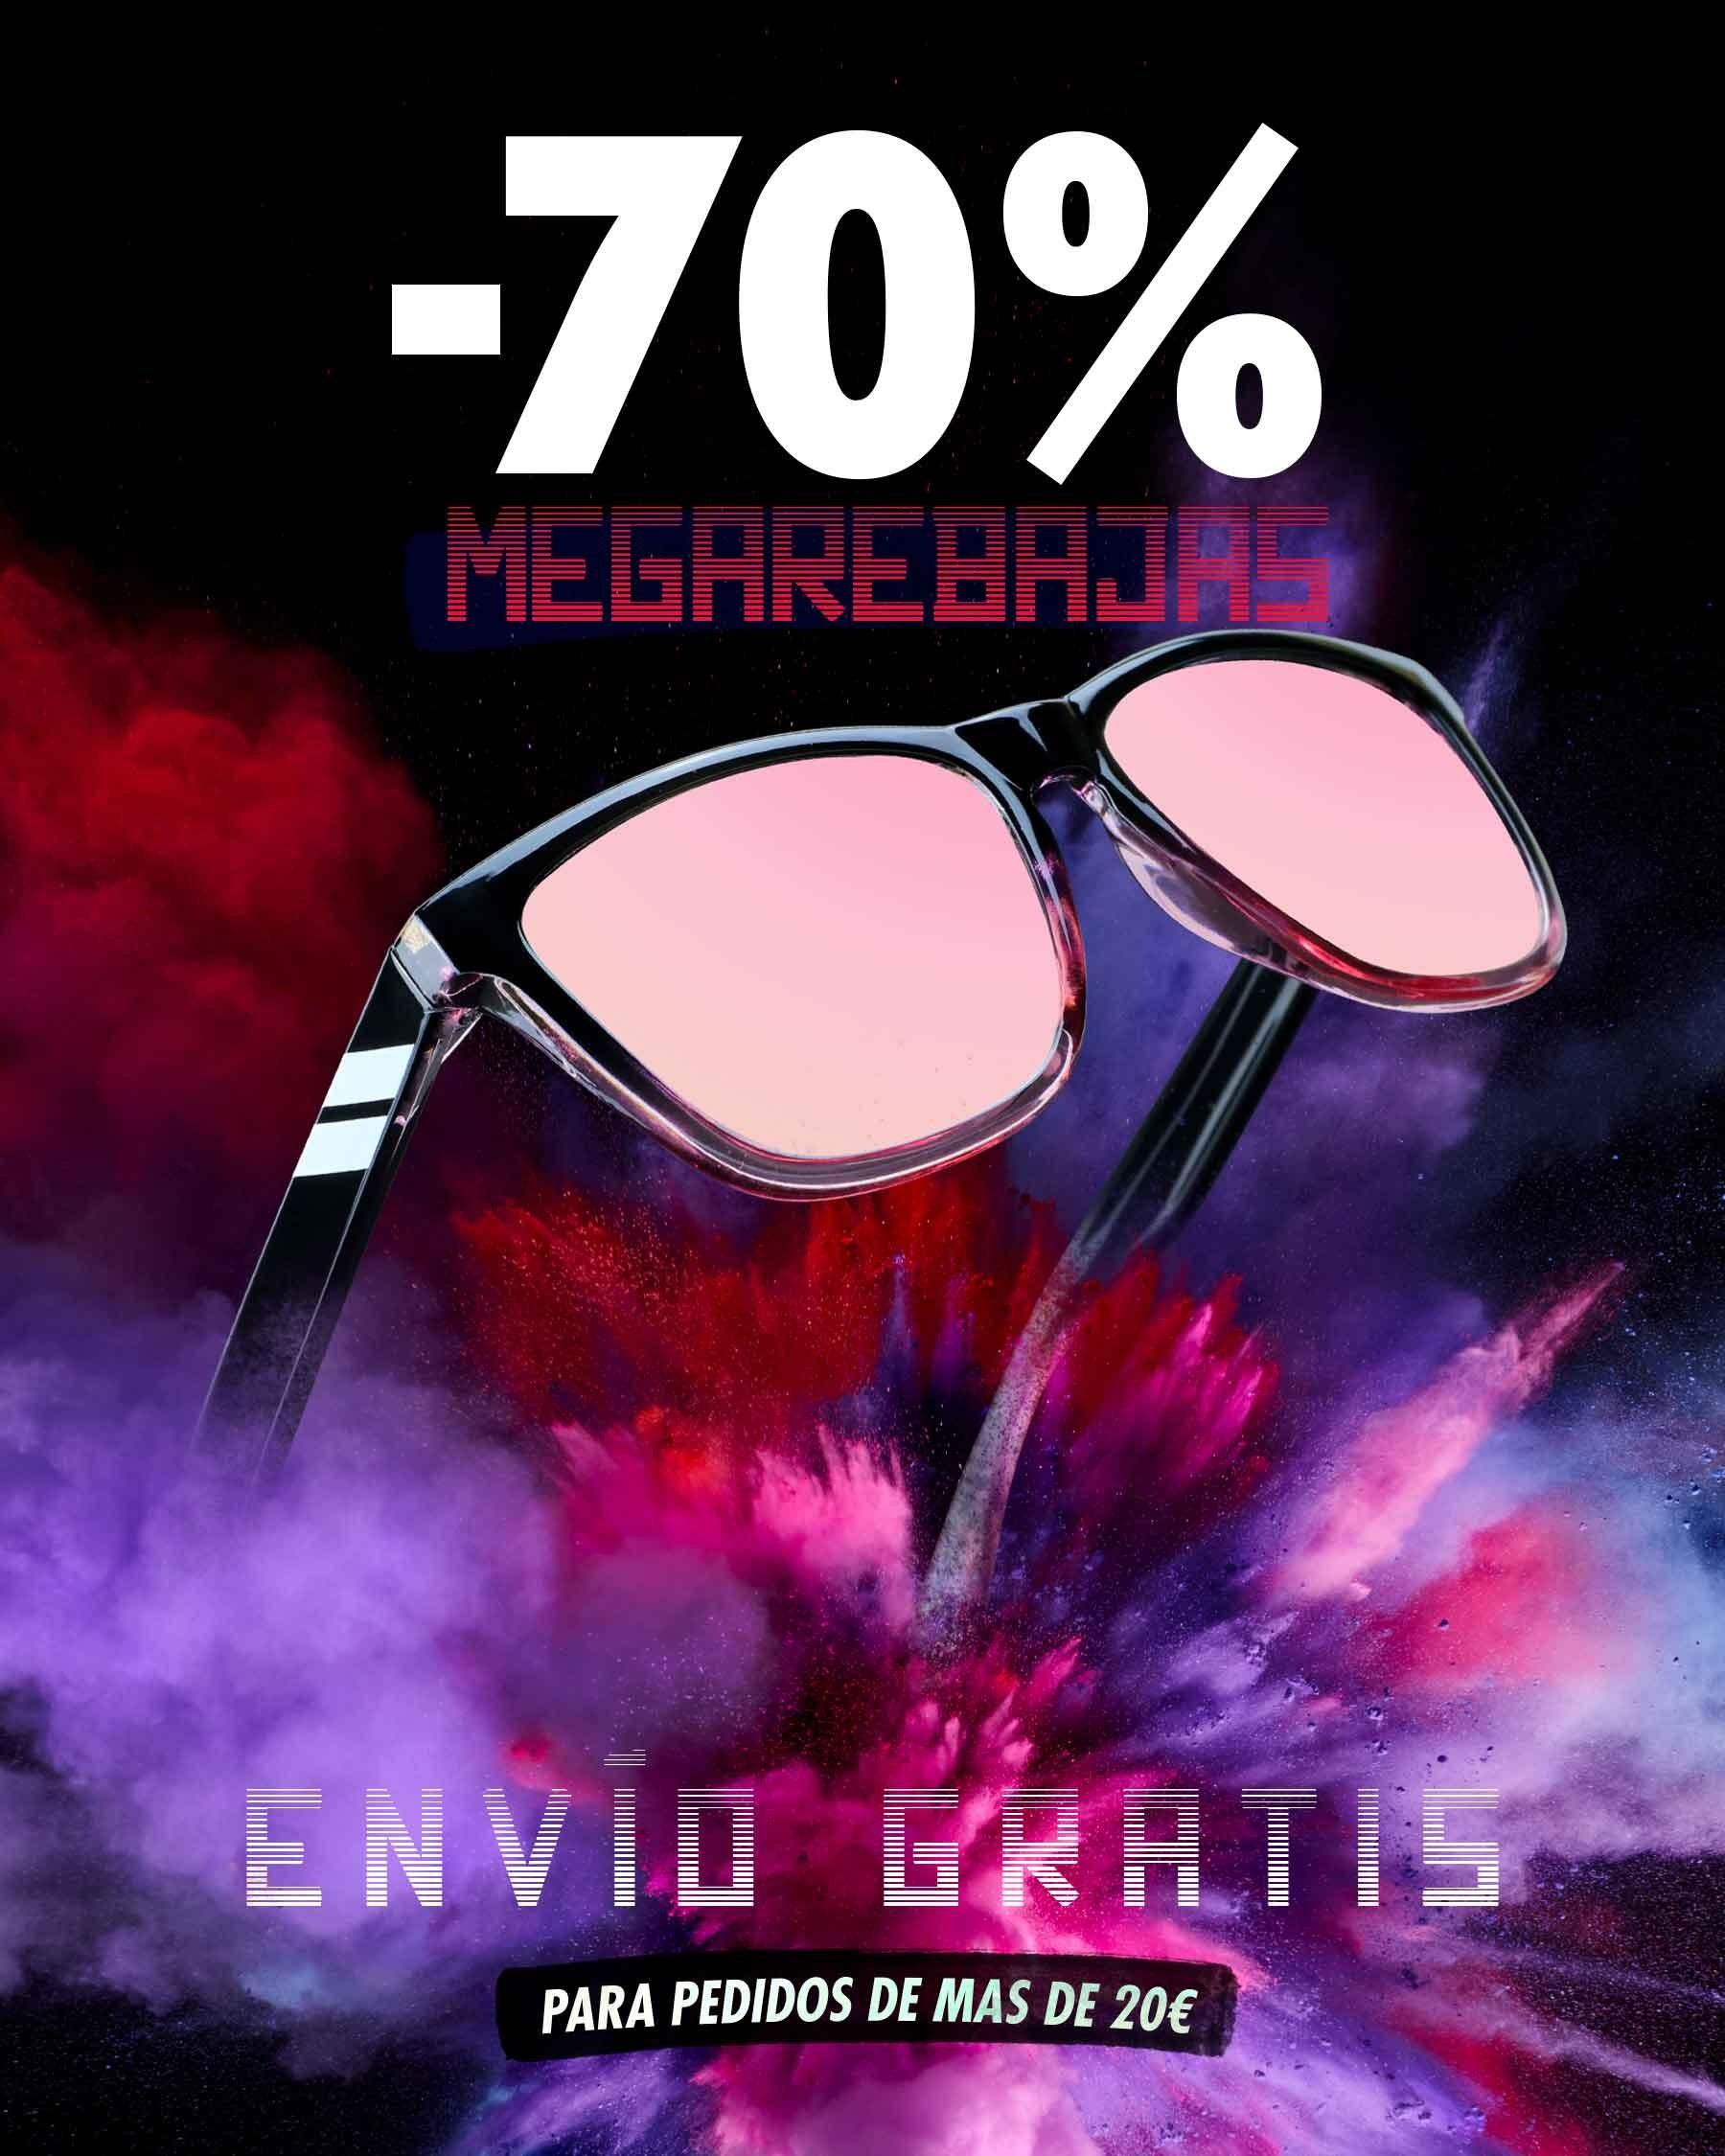 Megarebajas WOAX Sunglasses - 70%